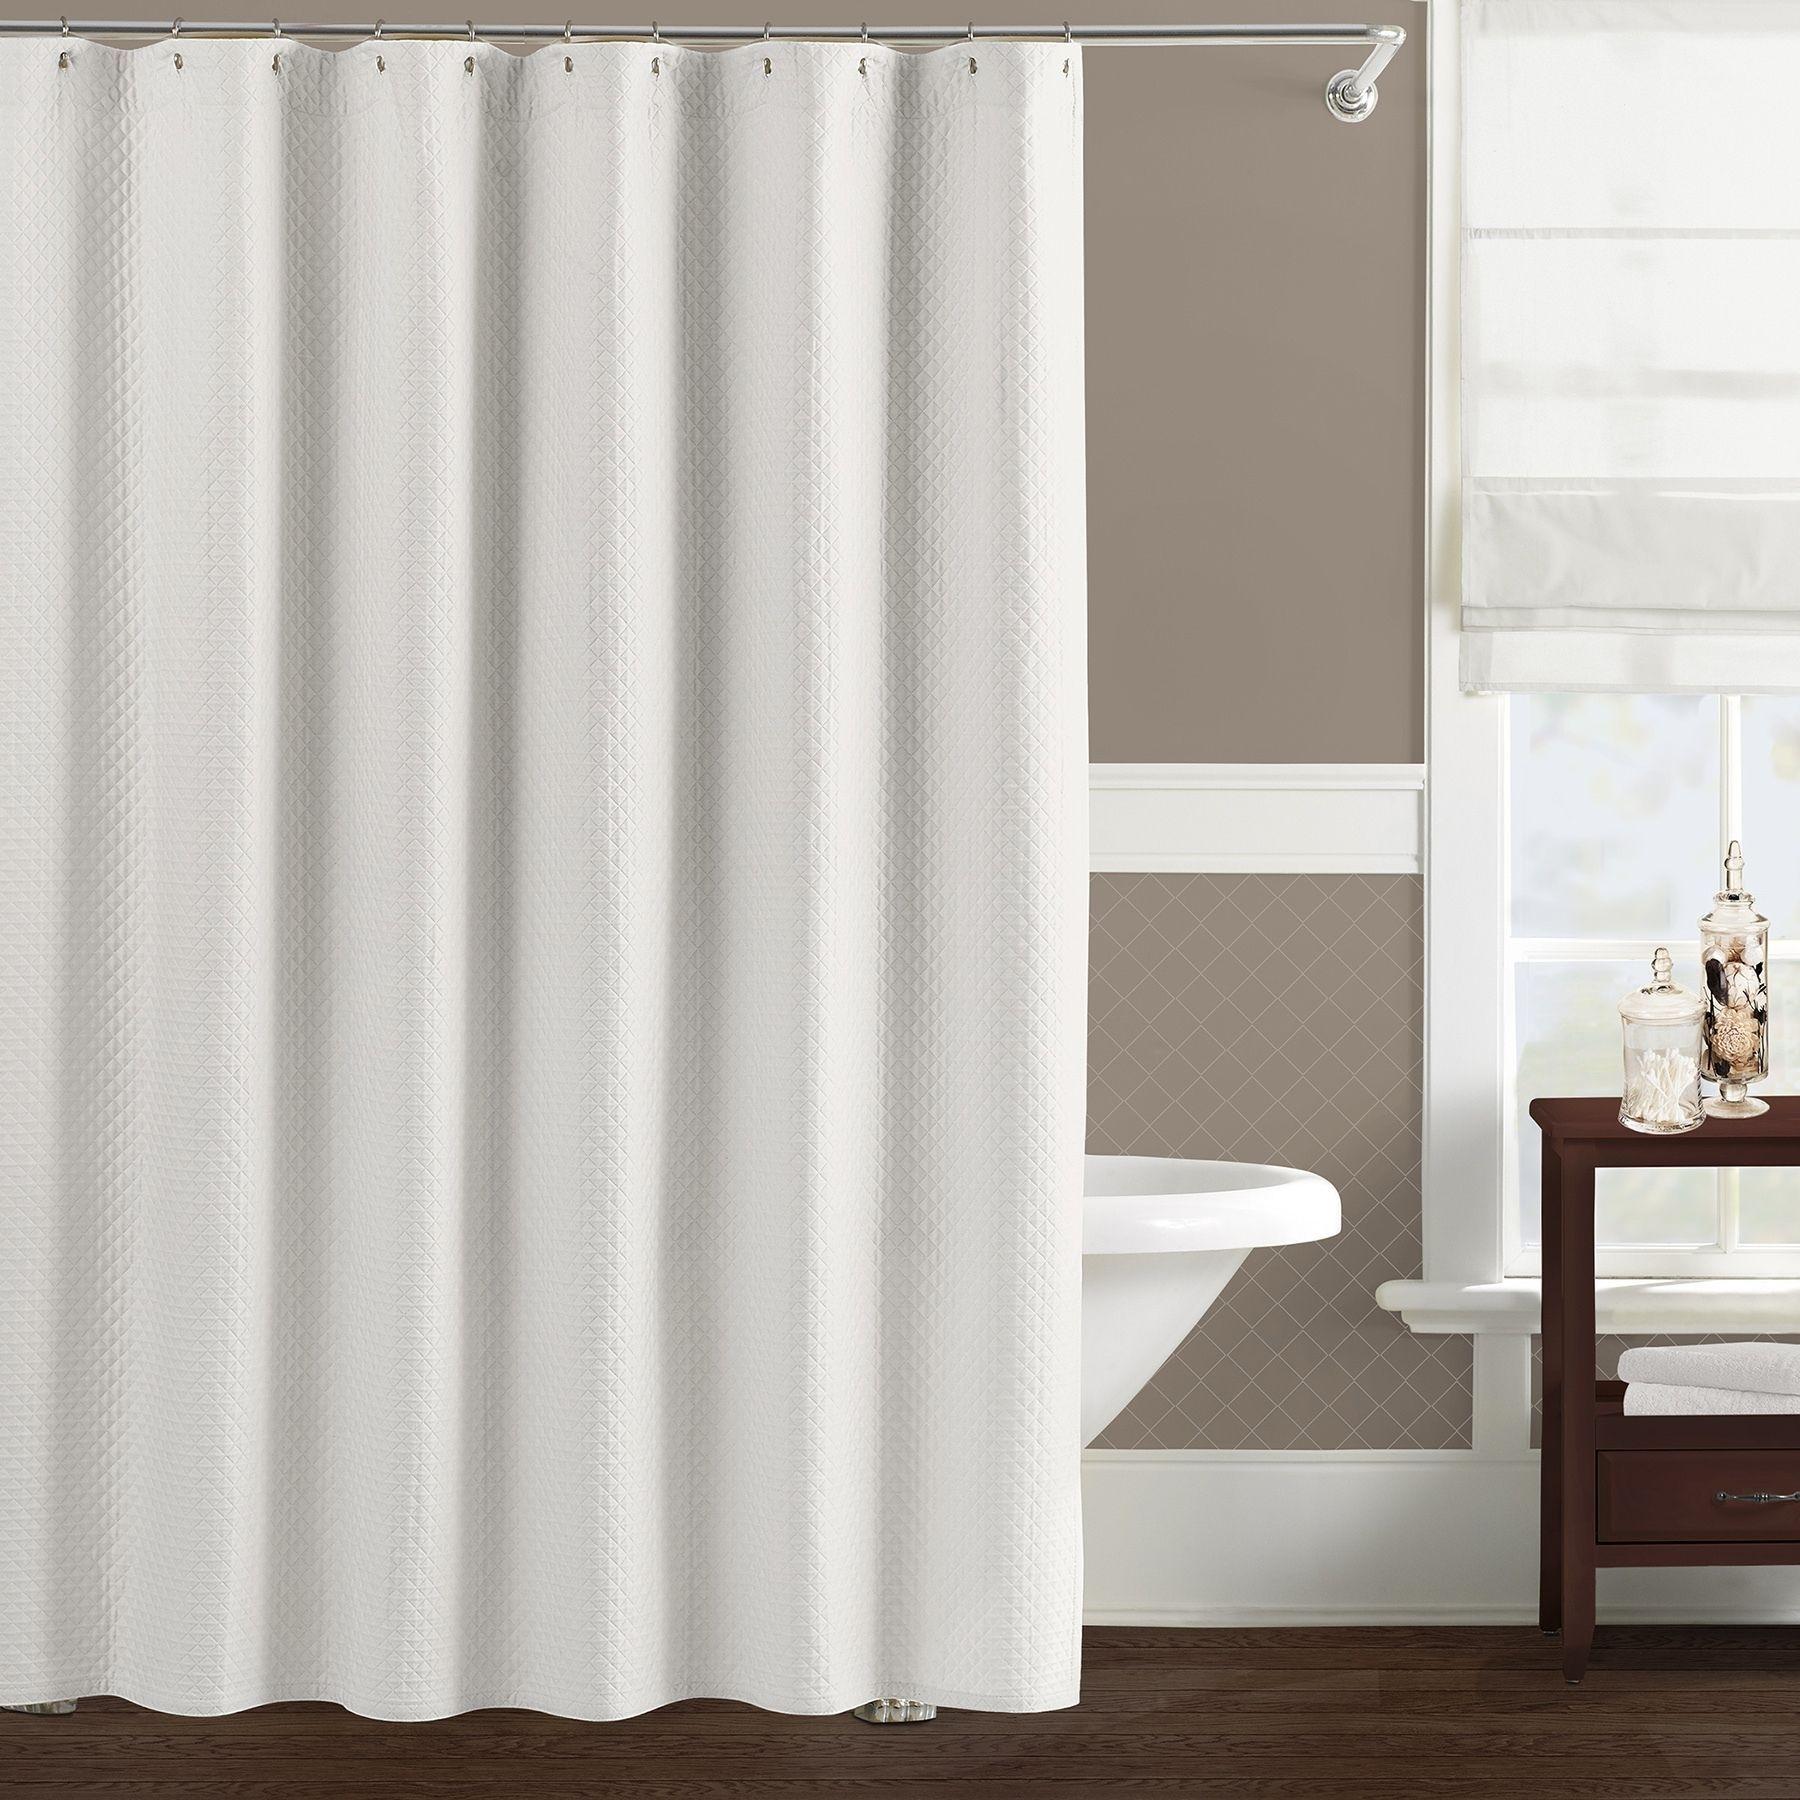 matelasse shower curtain ideas on foter